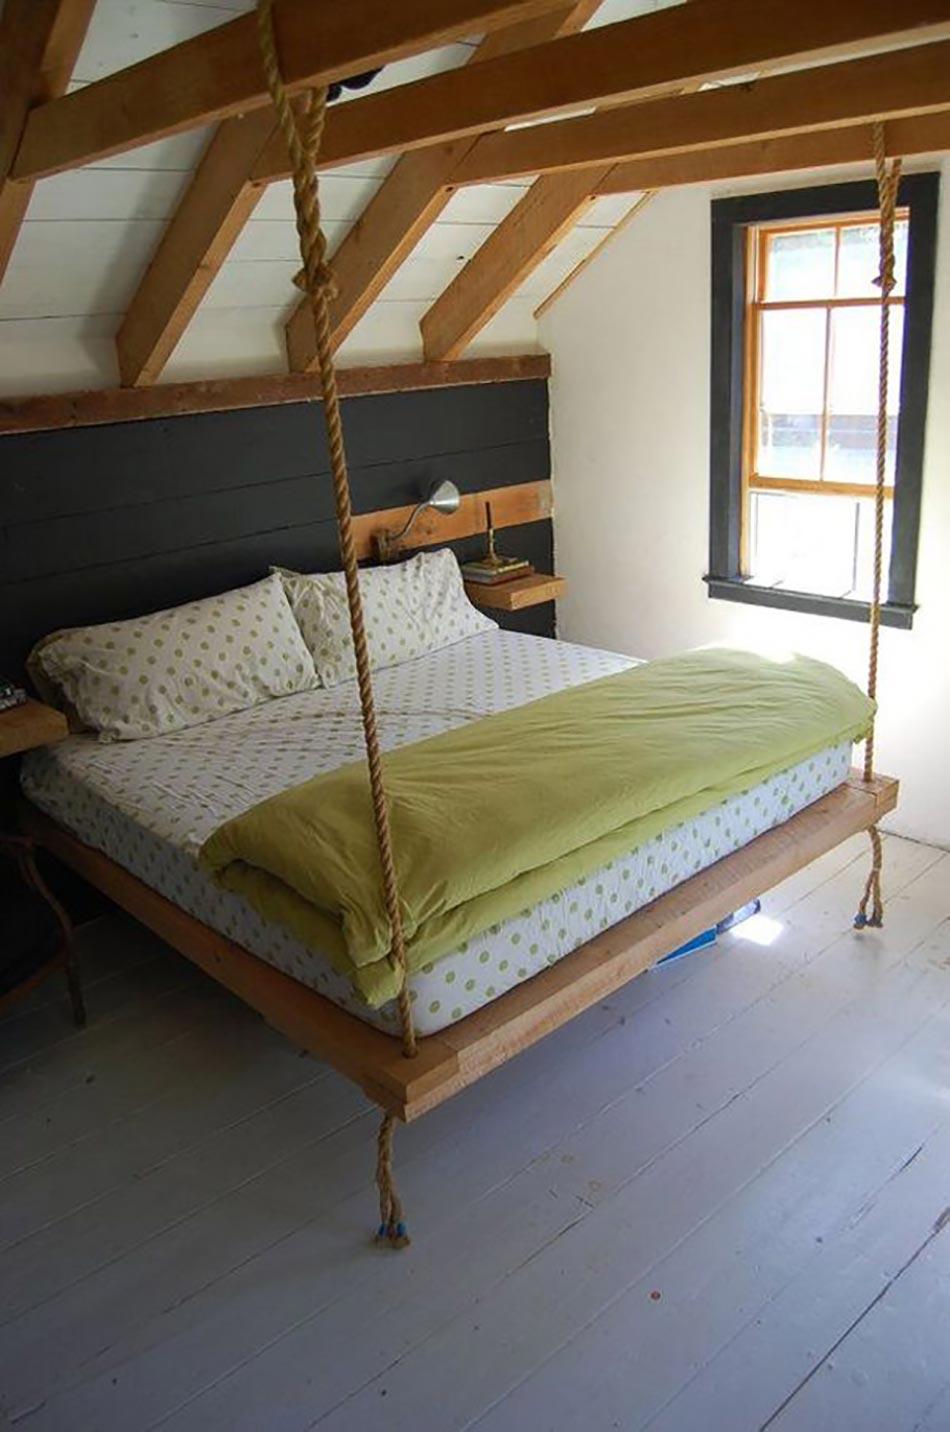 lit suspendu ou l originalit design dans notre chambre. Black Bedroom Furniture Sets. Home Design Ideas